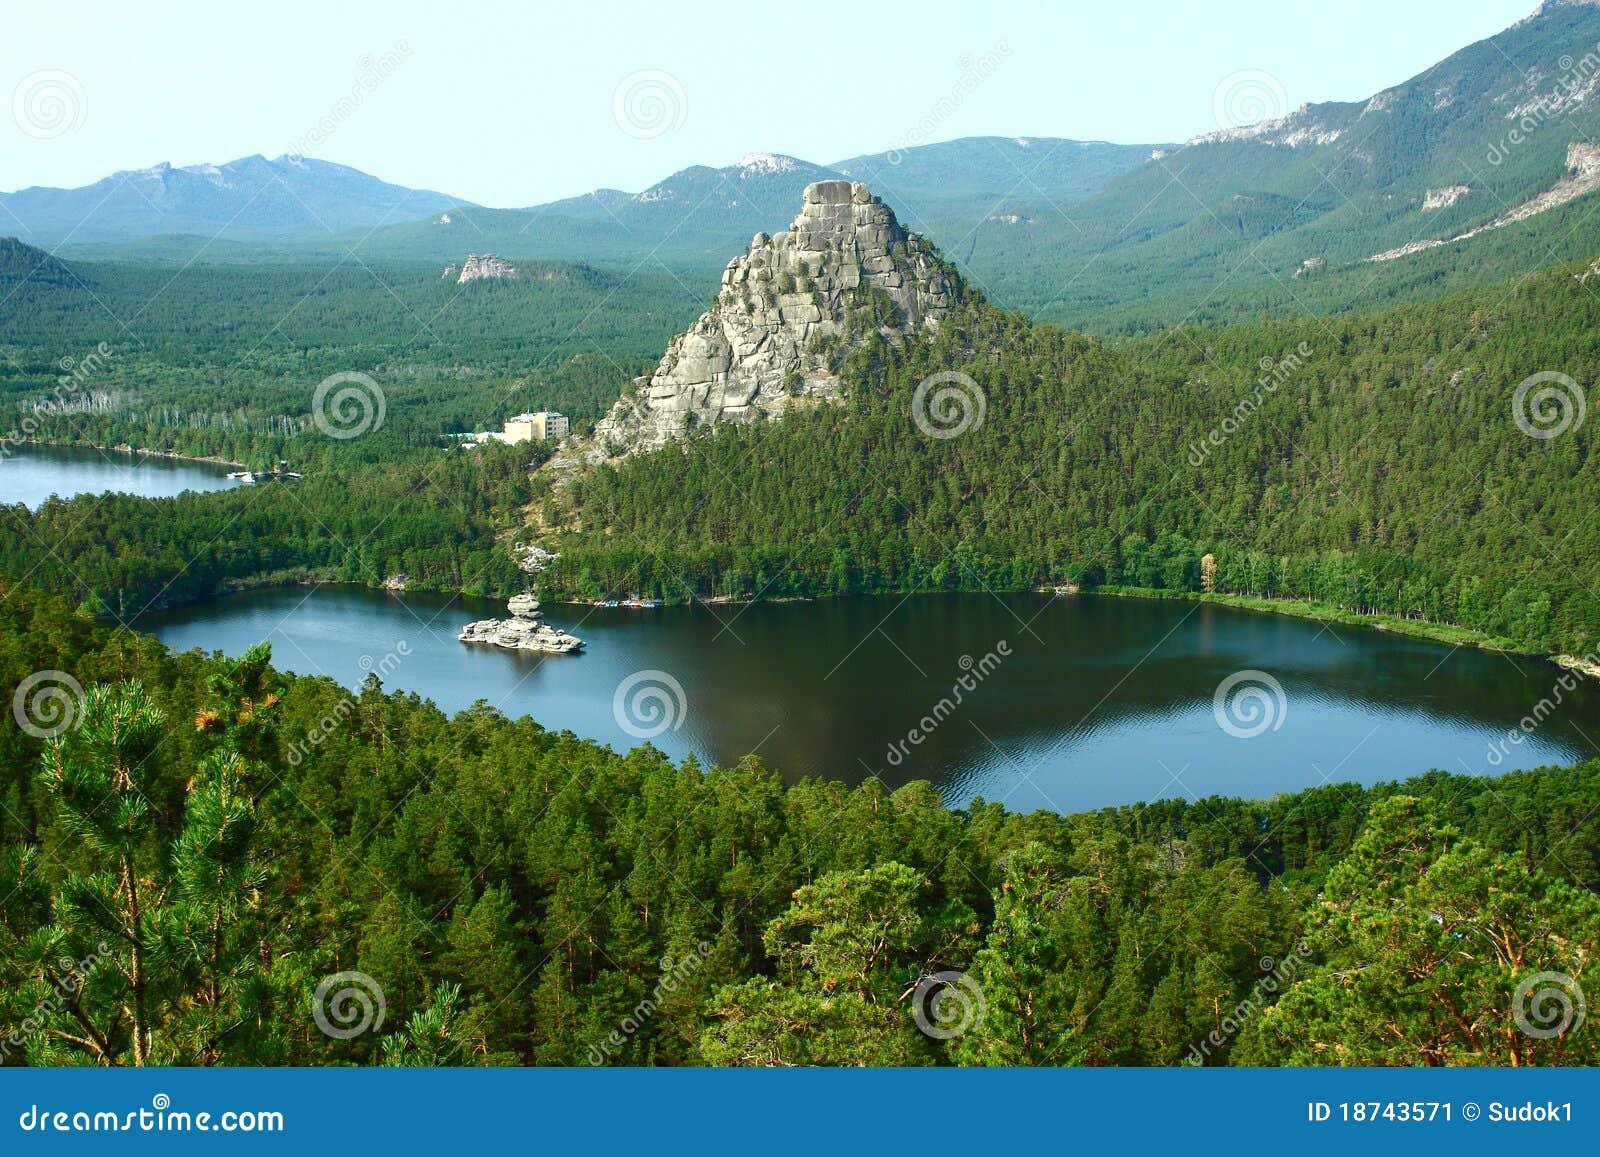 Borovoe Kazakhstan  city photos : Lake Borovoe In To Kazakhstan Stock Image Image: 18743571